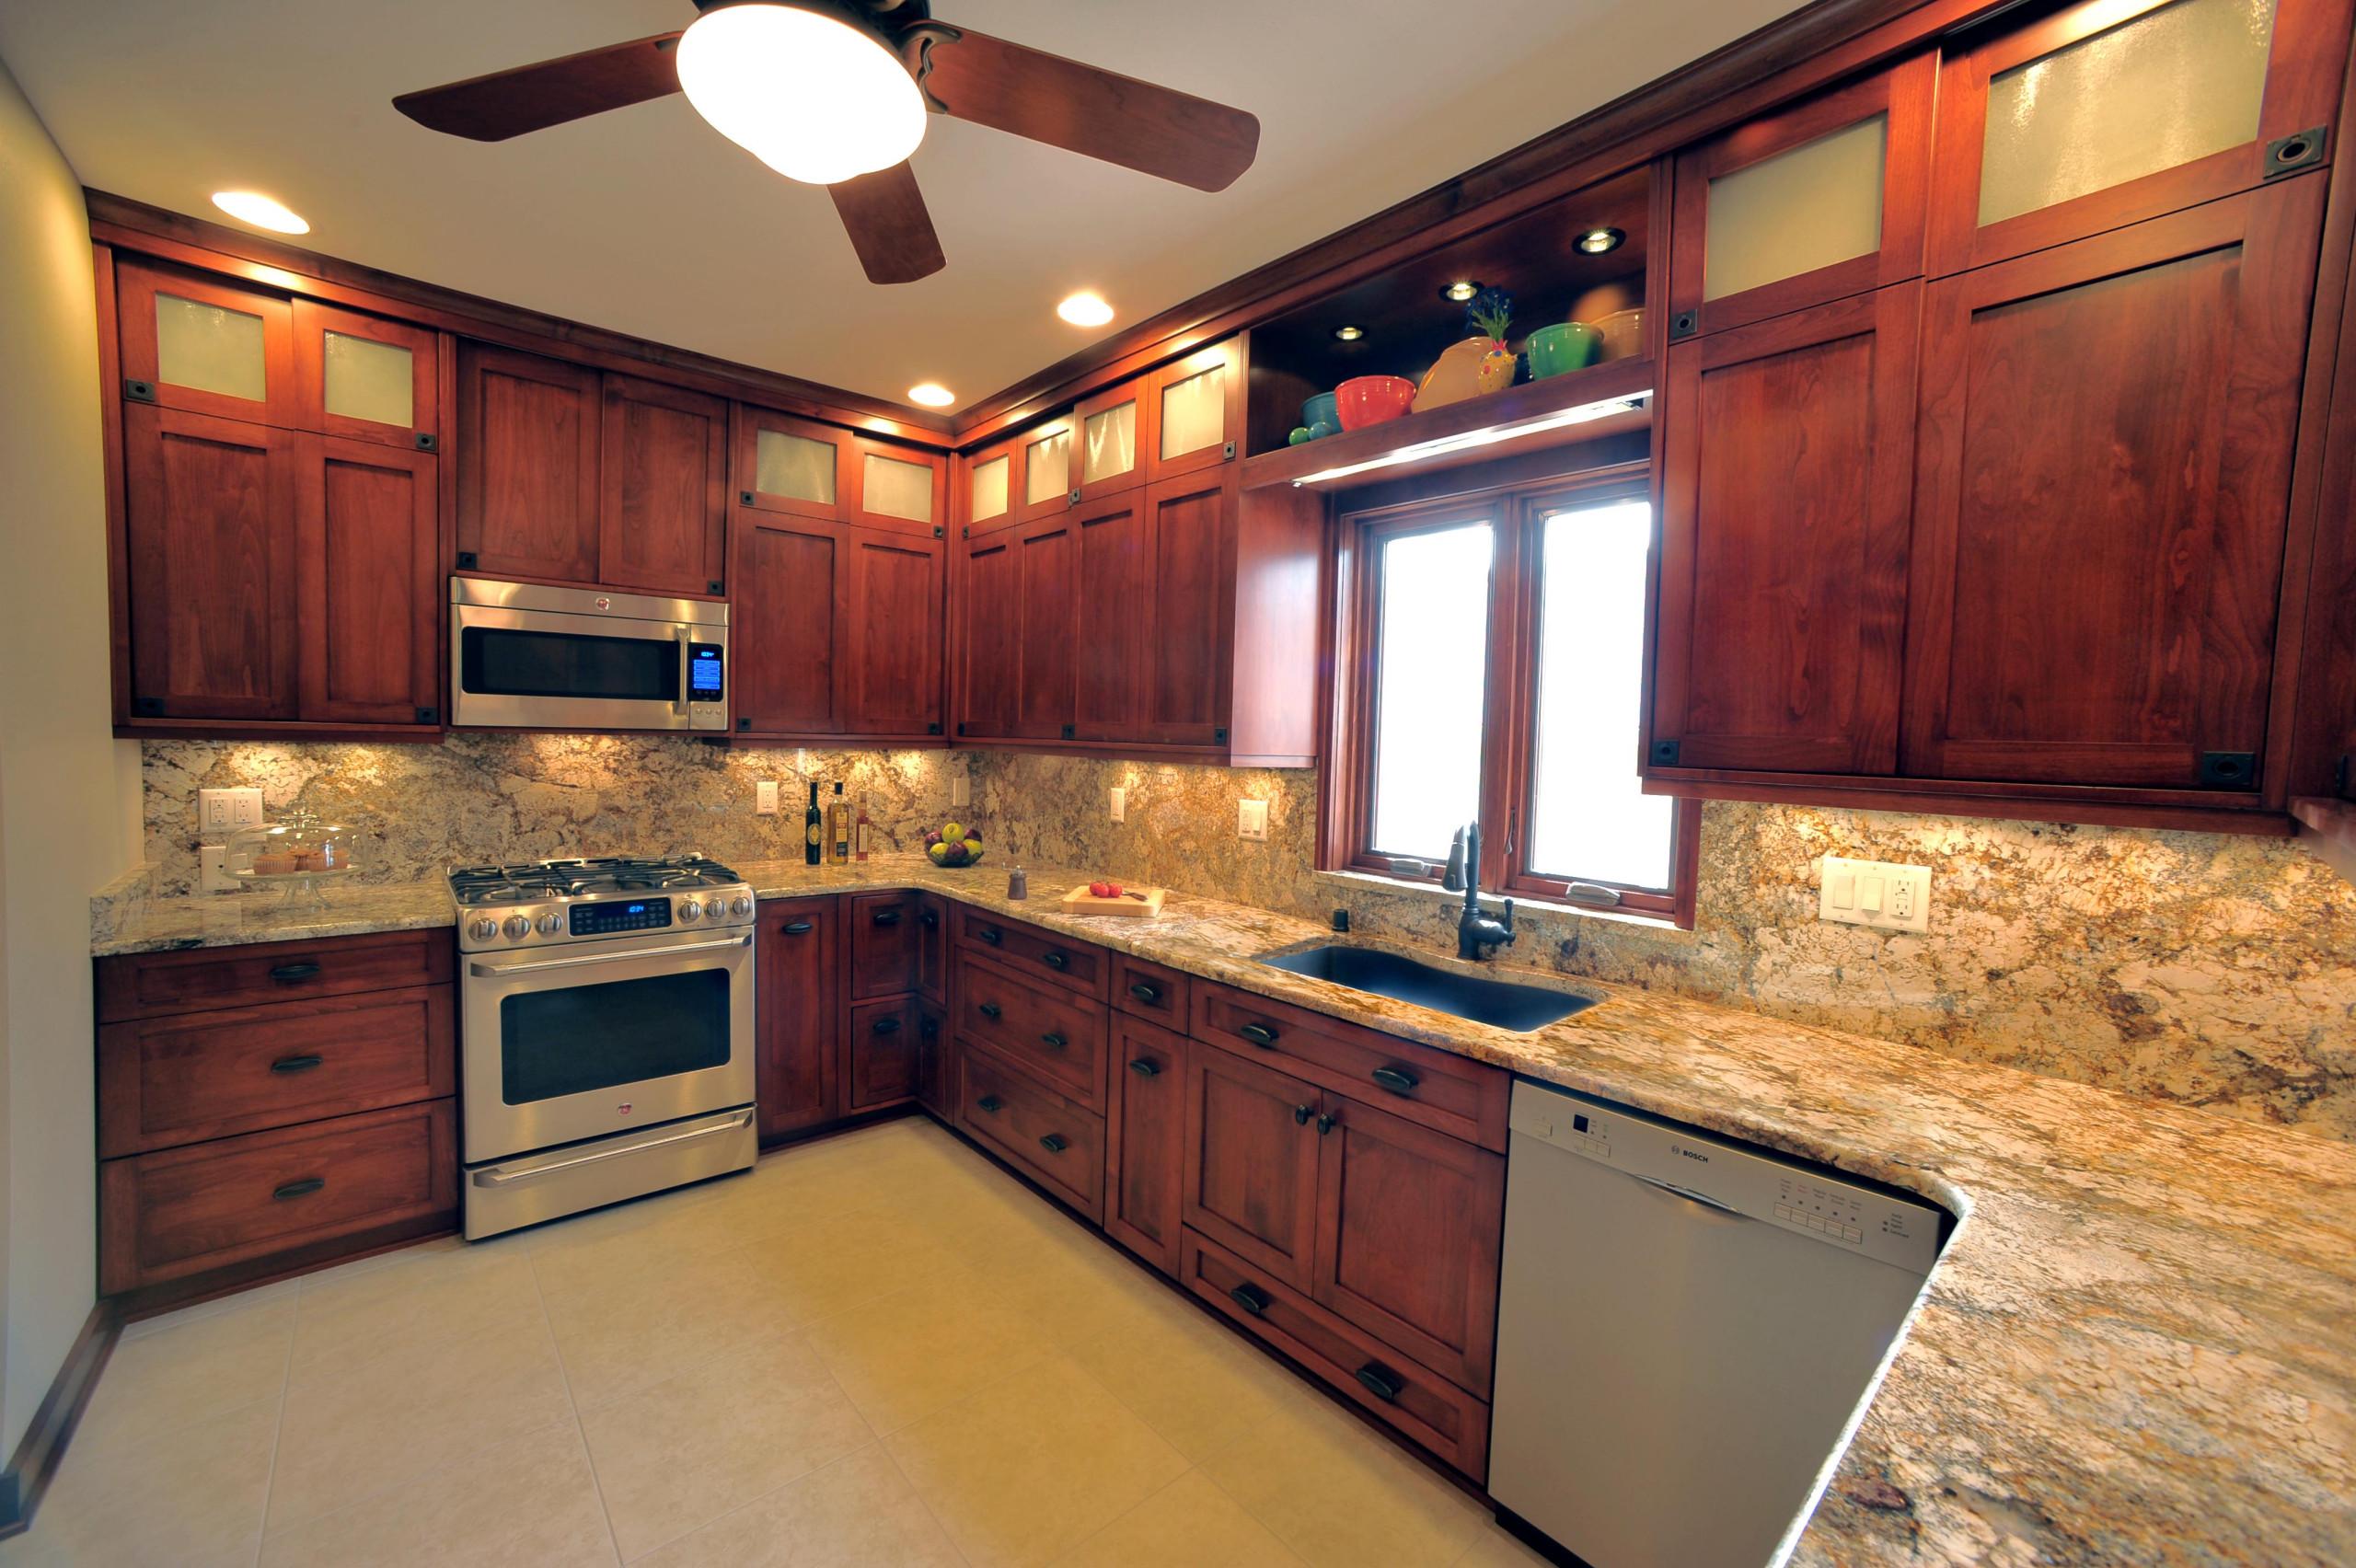 1920 S Milwaukee Bungalow Kitchen Remodel Traditional Kitchen Milwaukee By S J Janis Company Inc Houzz